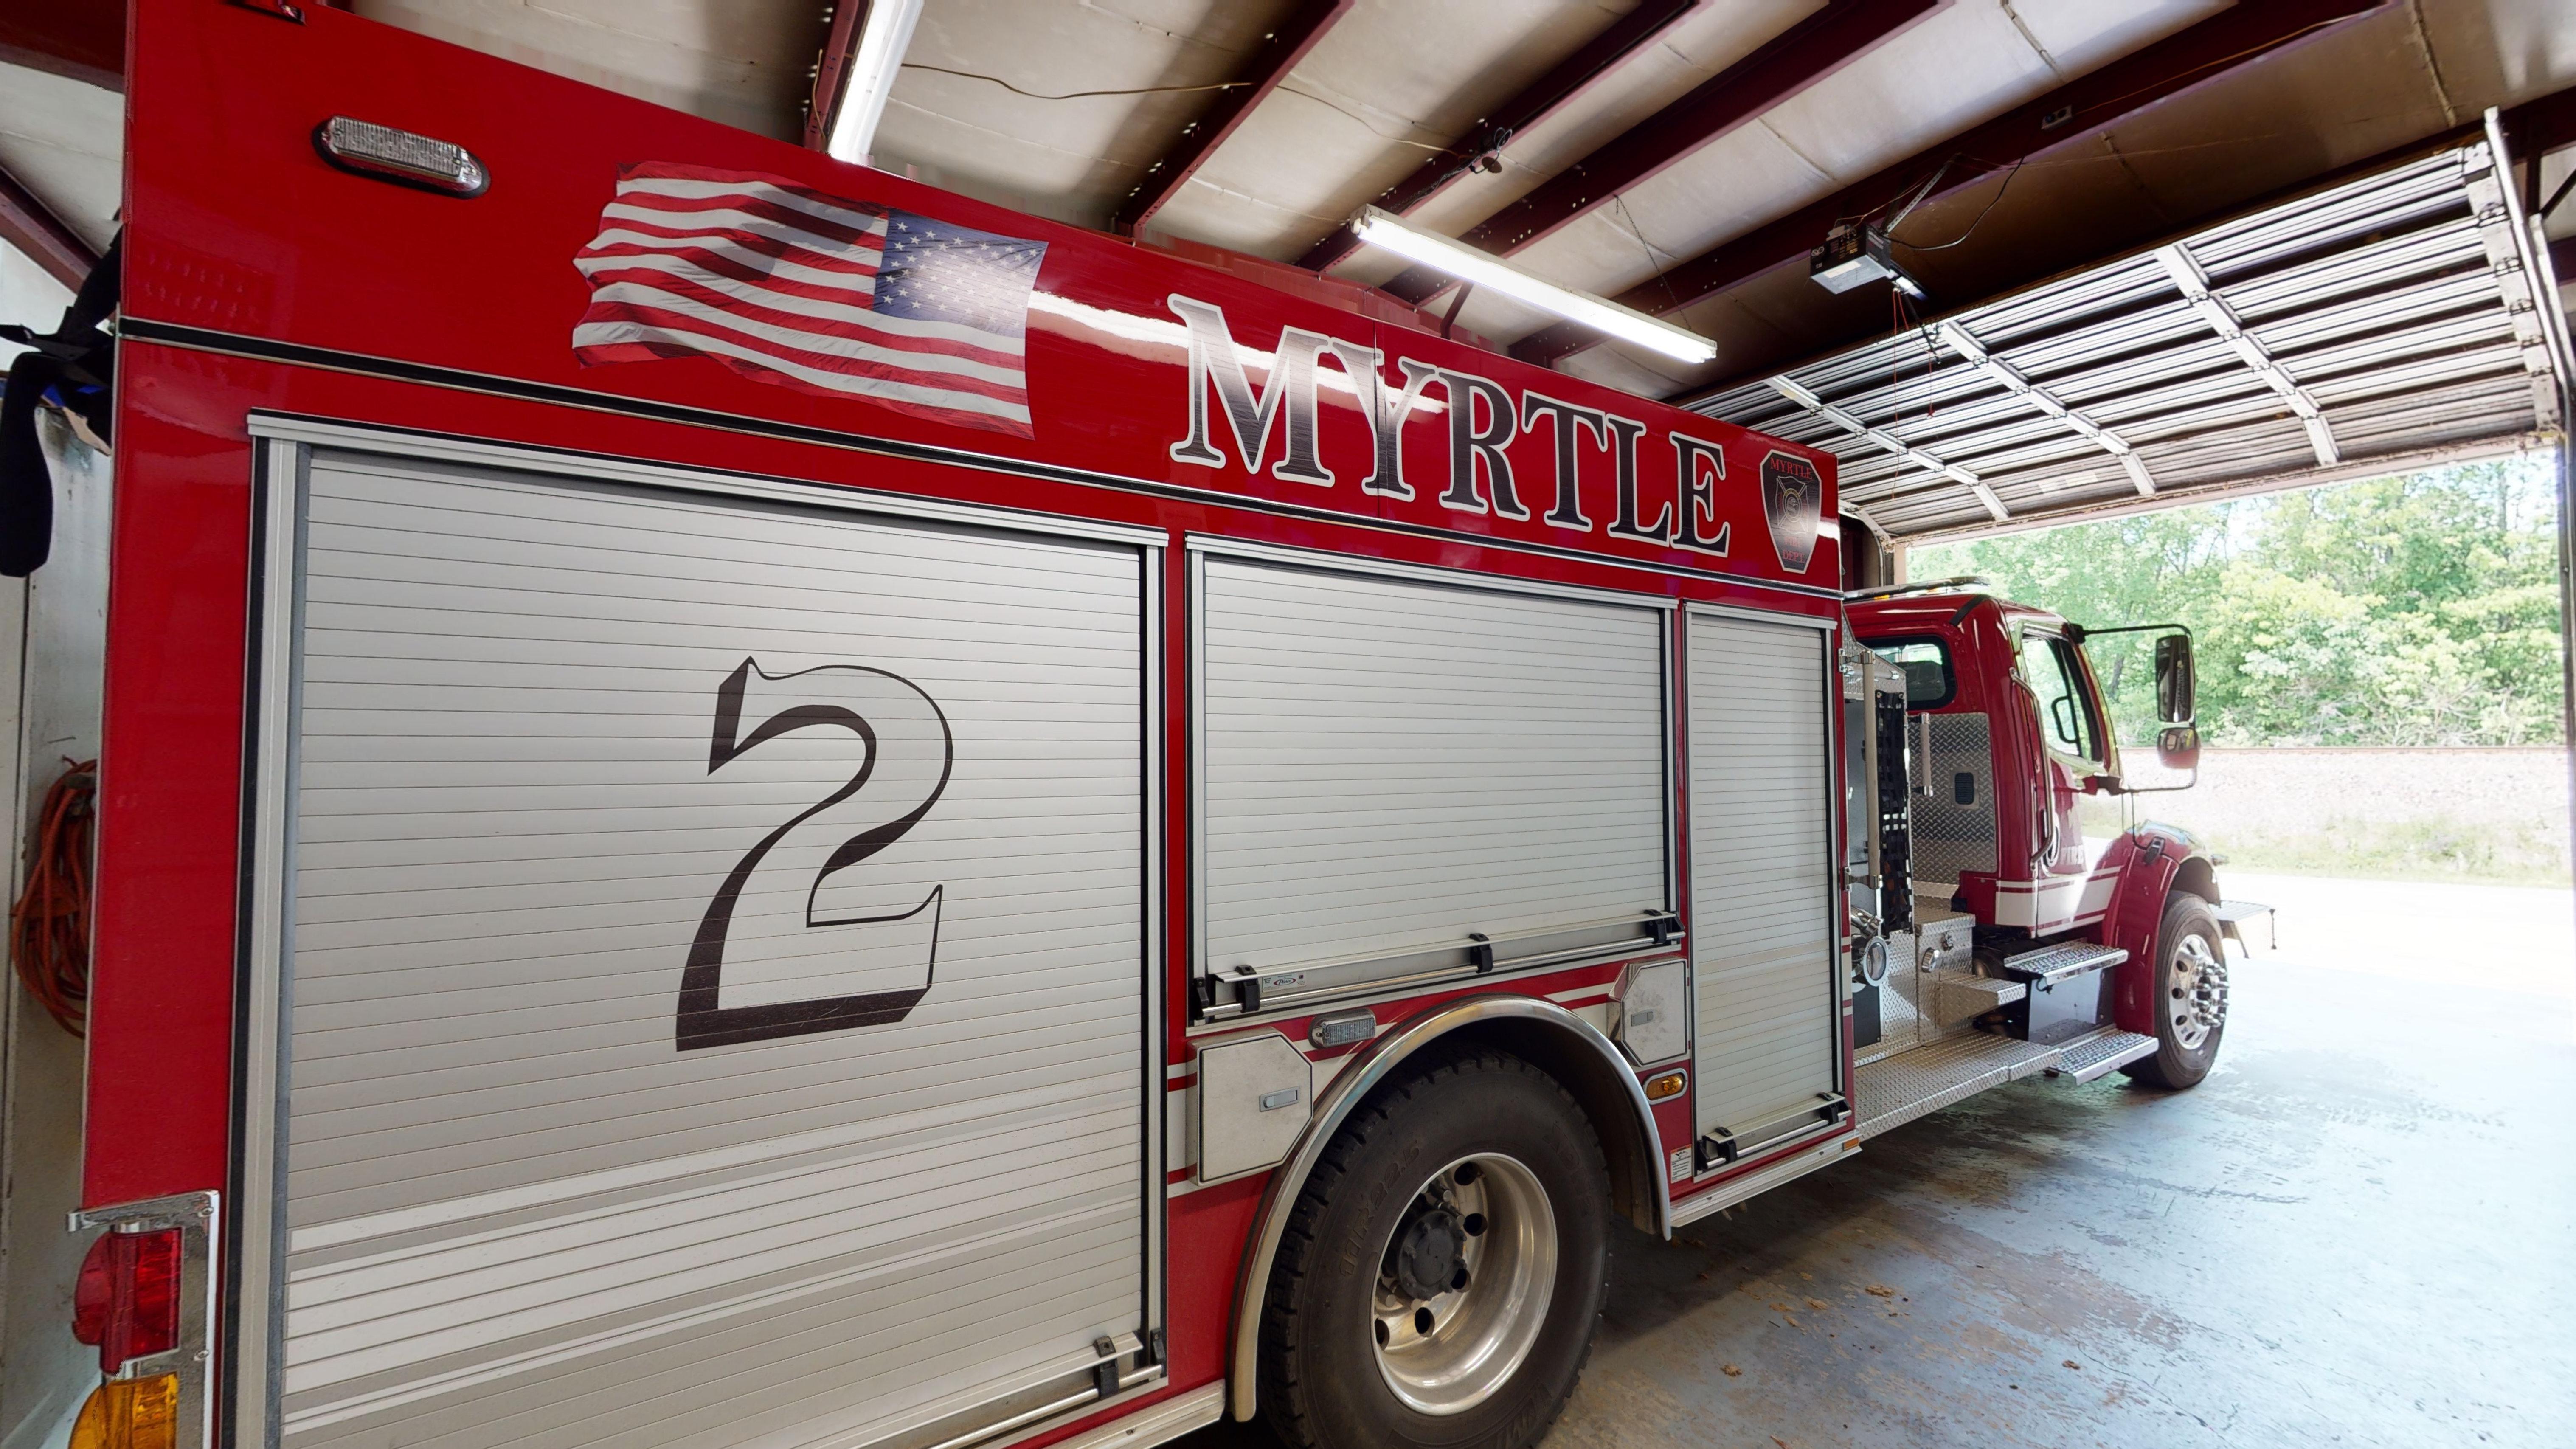 9_Myrtle-FD-Commercial-Pumper-05282021_121102